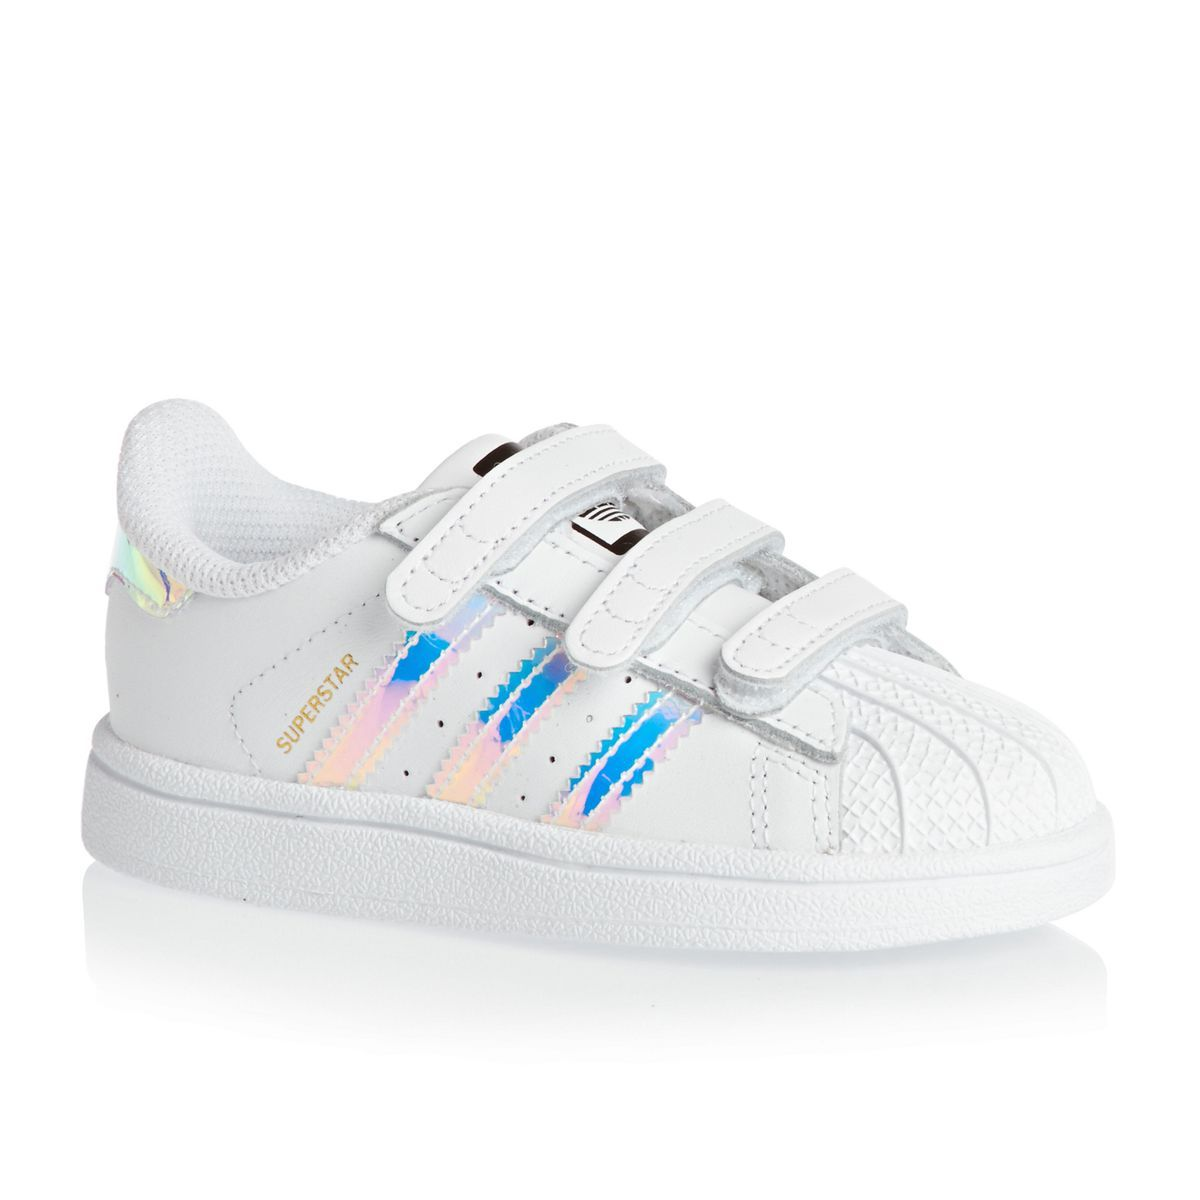 Prueba Idear Abuelo  Baskets Adidas Originals Superstar Cf I White/ Metallic Silver autre lien :  https://www.footlocker.fr/fr/p/adidas-supers… | Baskets adidas, Adidas  superstar, Adidas